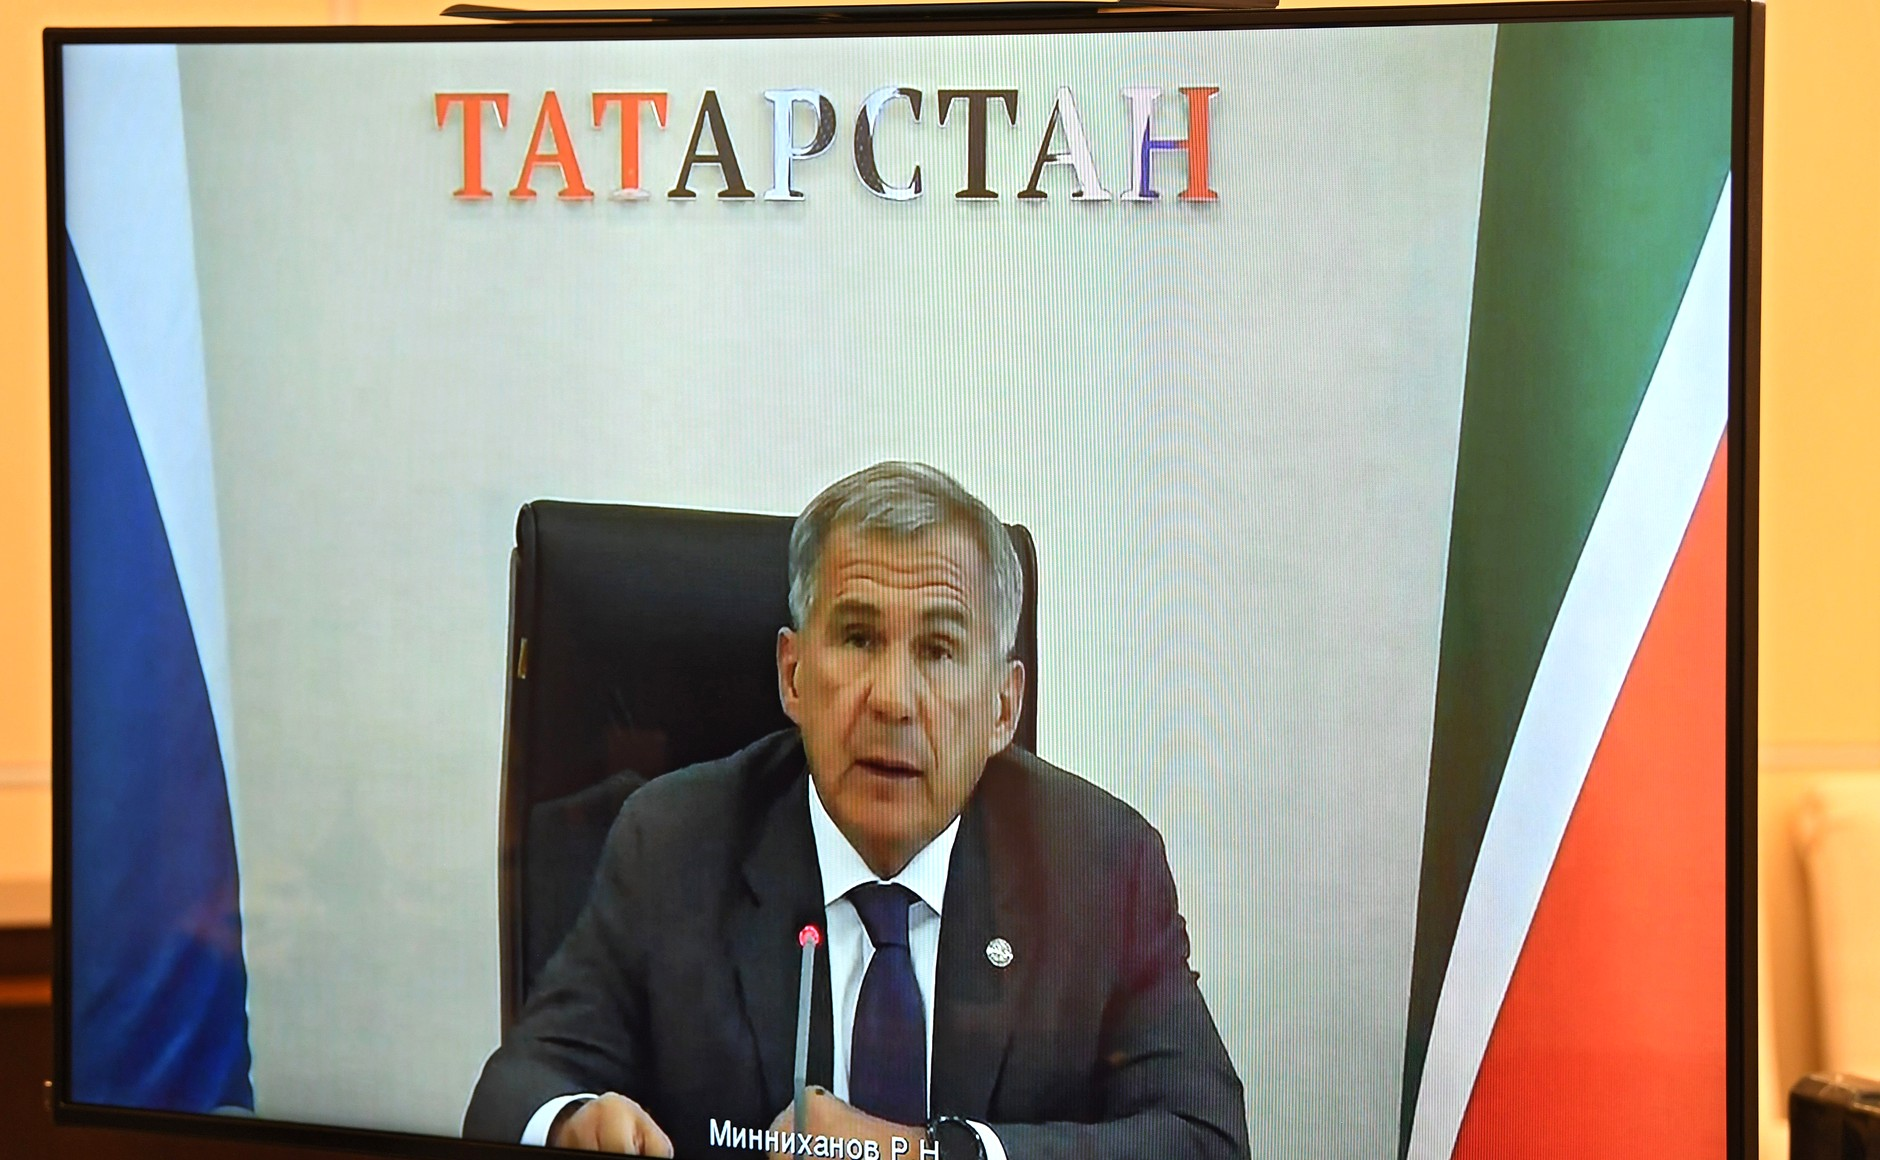 kremlin 2 X 3 DU 28.08.2020 Réunion de travail avec le chef du Tatarstan Rustam Minnikhanov (par vidéoconférence). UyFoAvH2rTq4ptpA9dk70NnQACTVkyQW